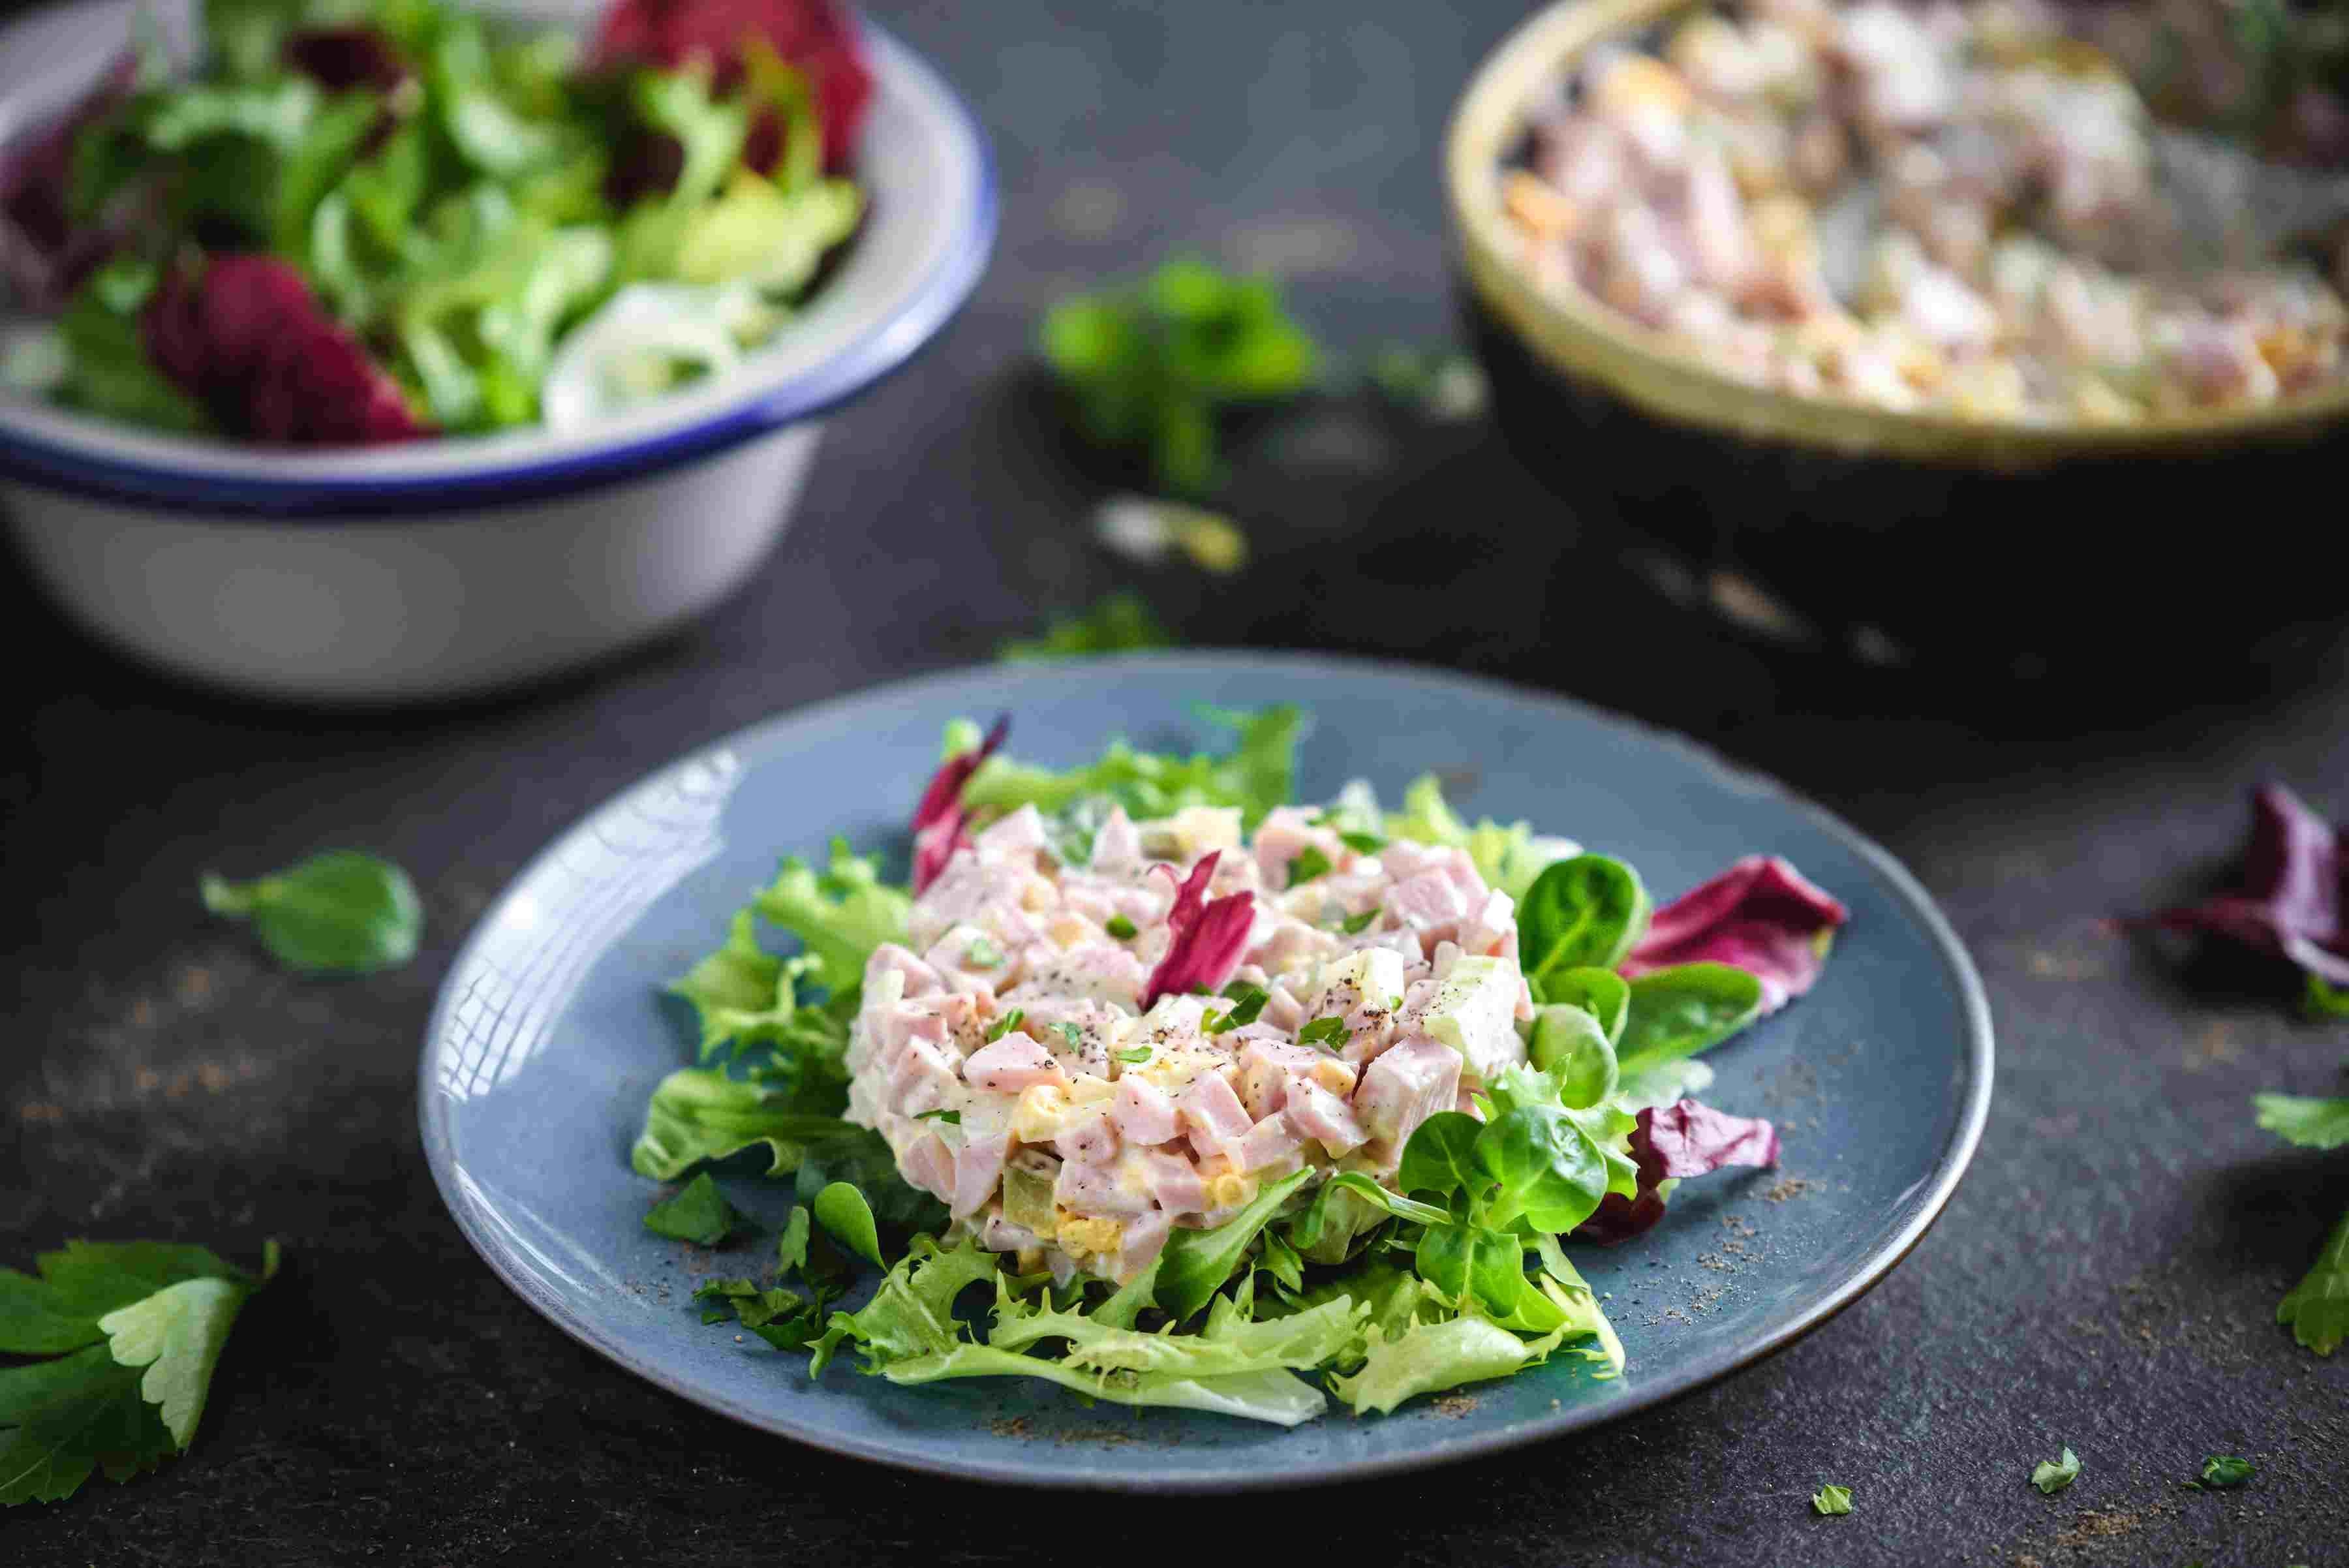 Southern style ham salad